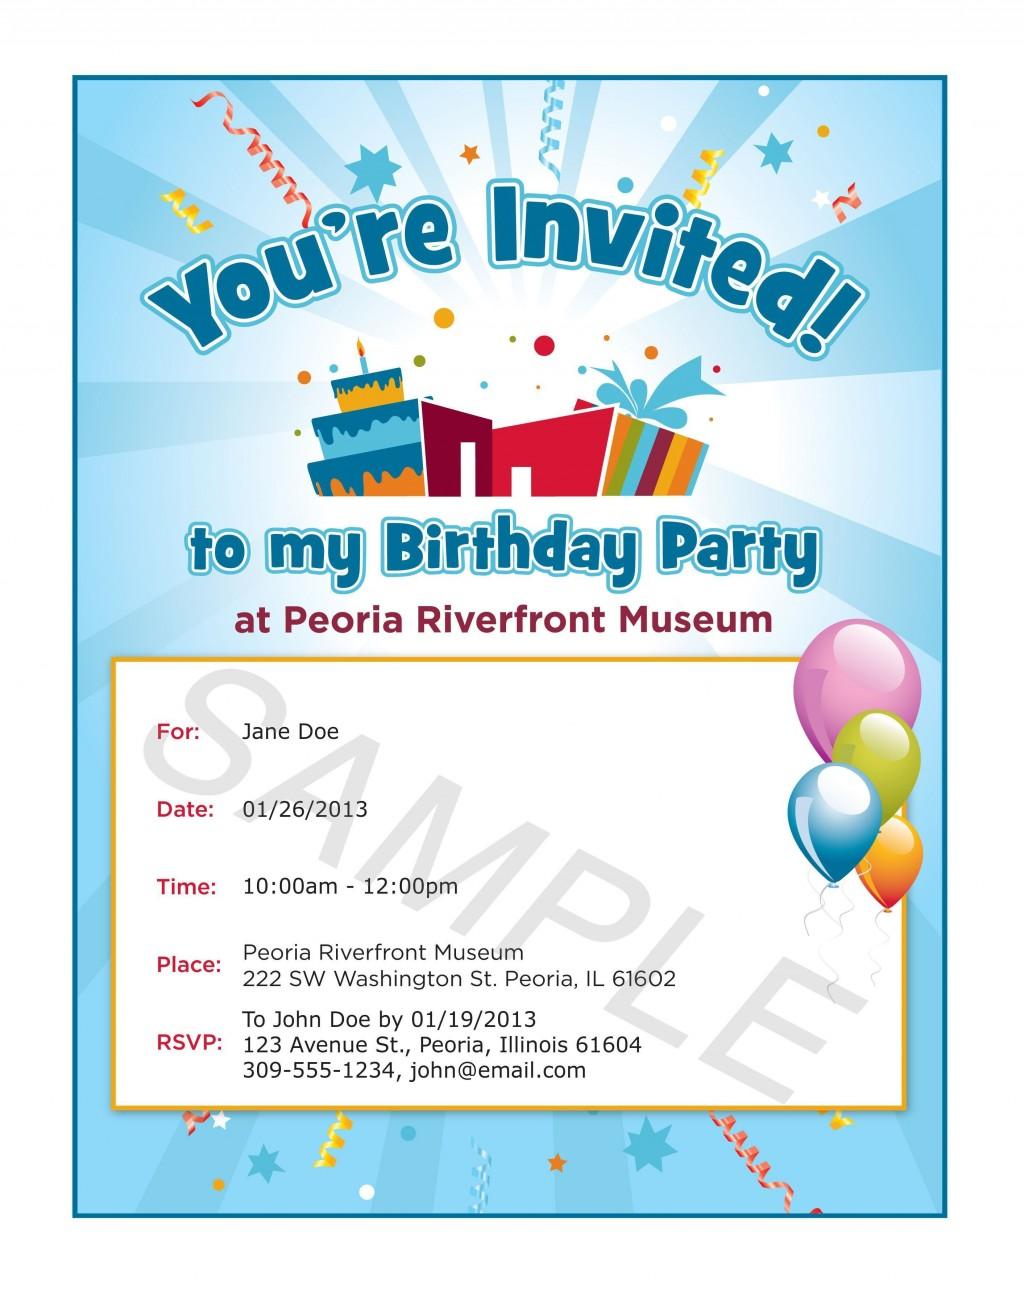 000 Rare Birthday Invite Template Word Free Concept  Party InvitationLarge